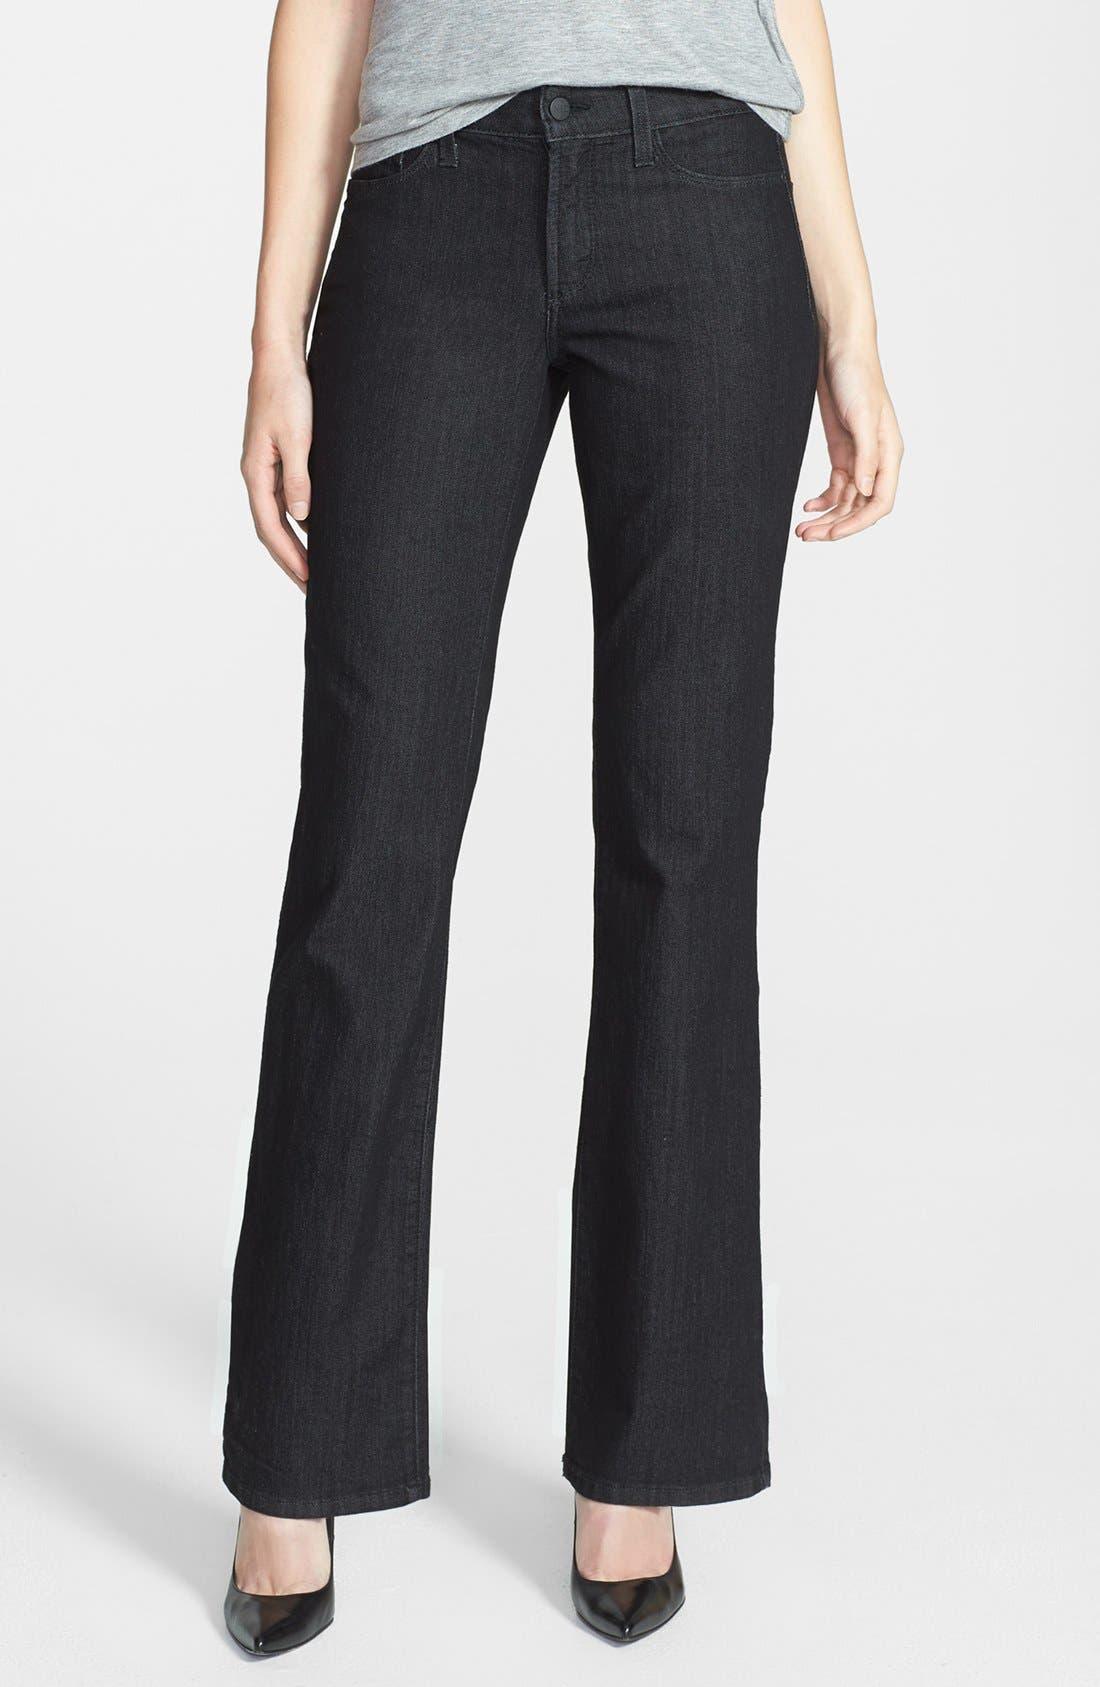 Main Image - NYDJ 'Barbara' Stretch Bootcut Jeans (Dark Enzyme)